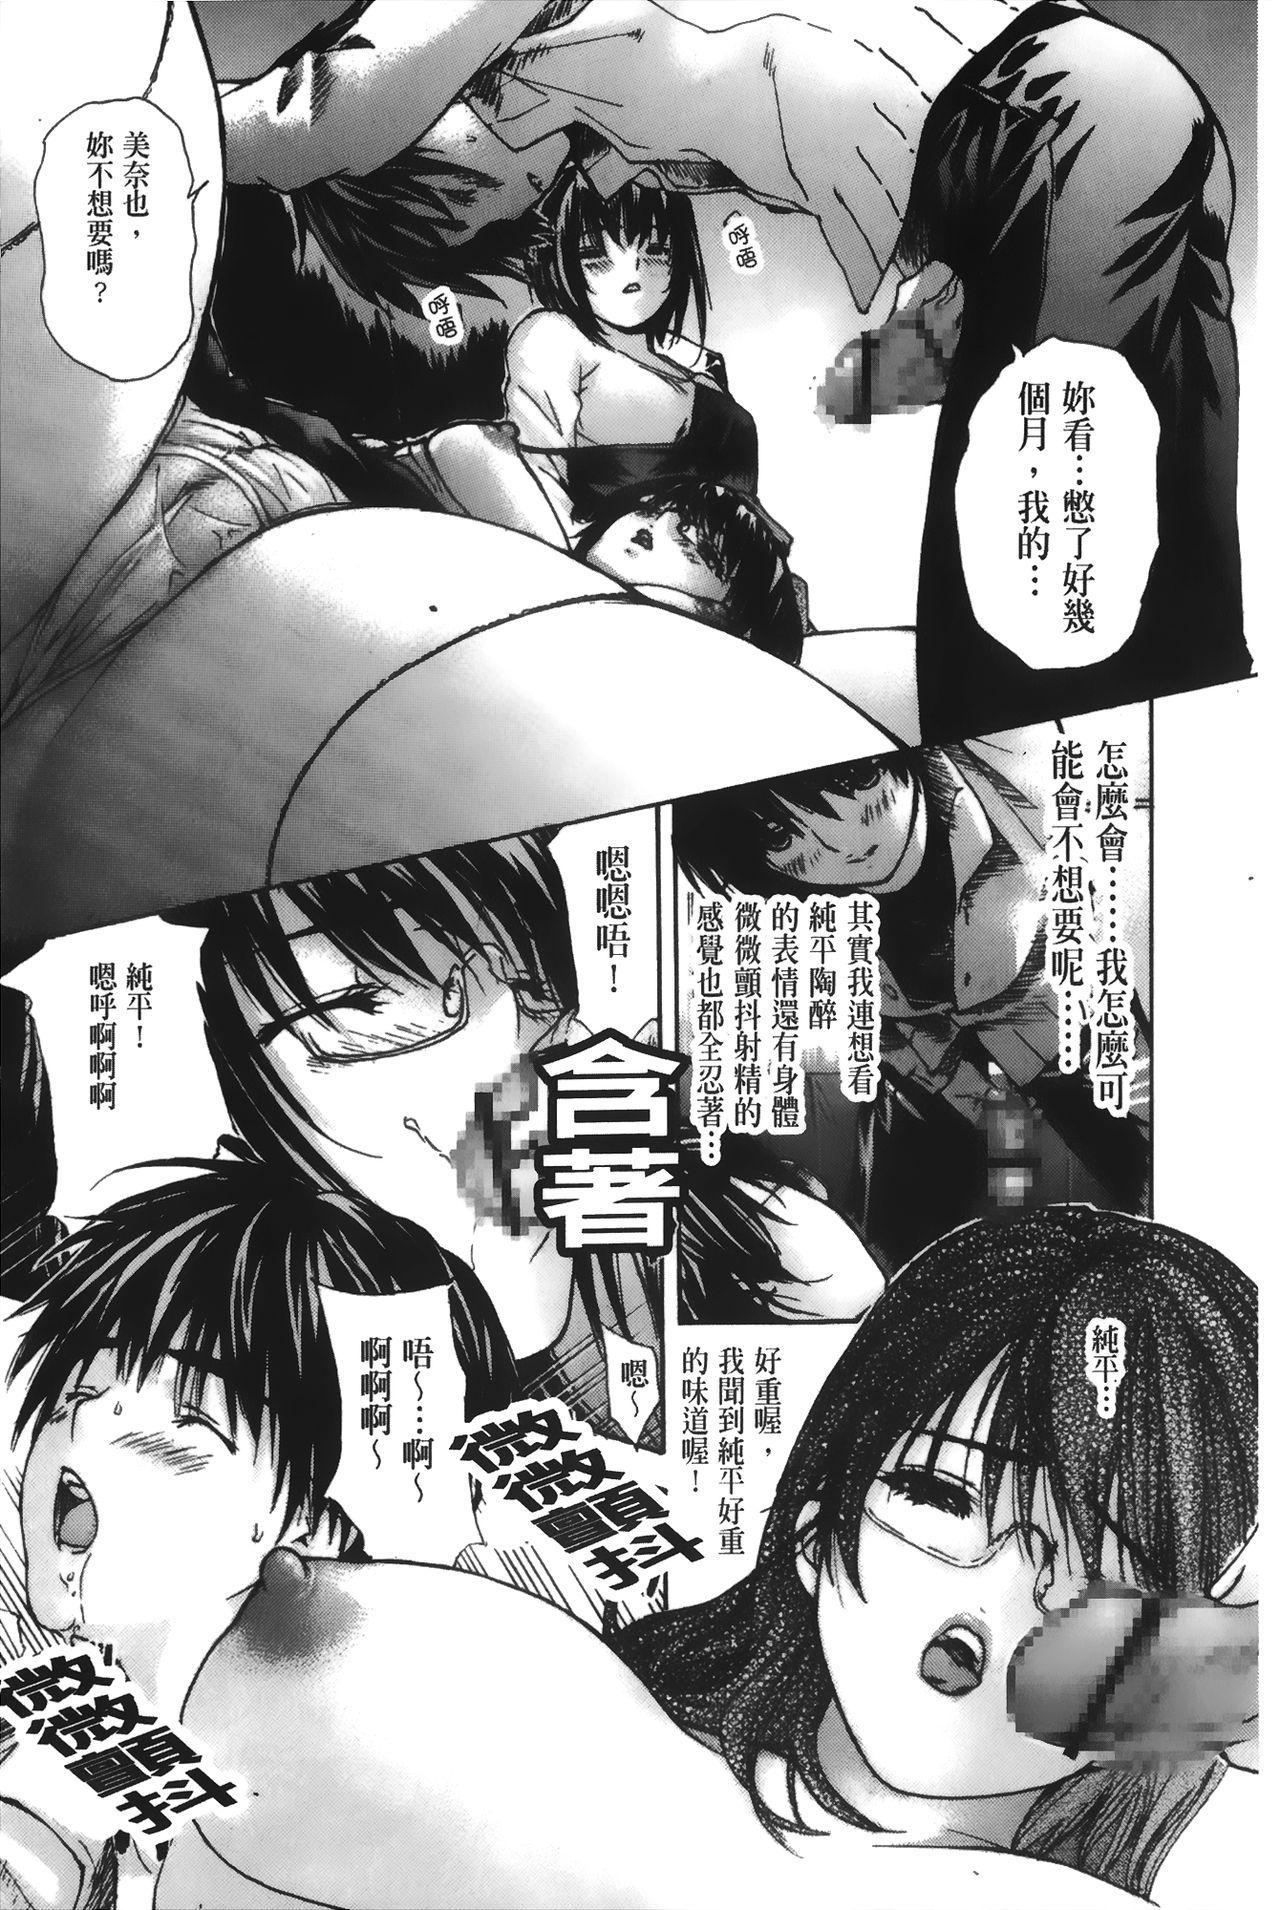 Tonari no Minano Sensei 4 | 隔壁的美奈乃老師 4 210